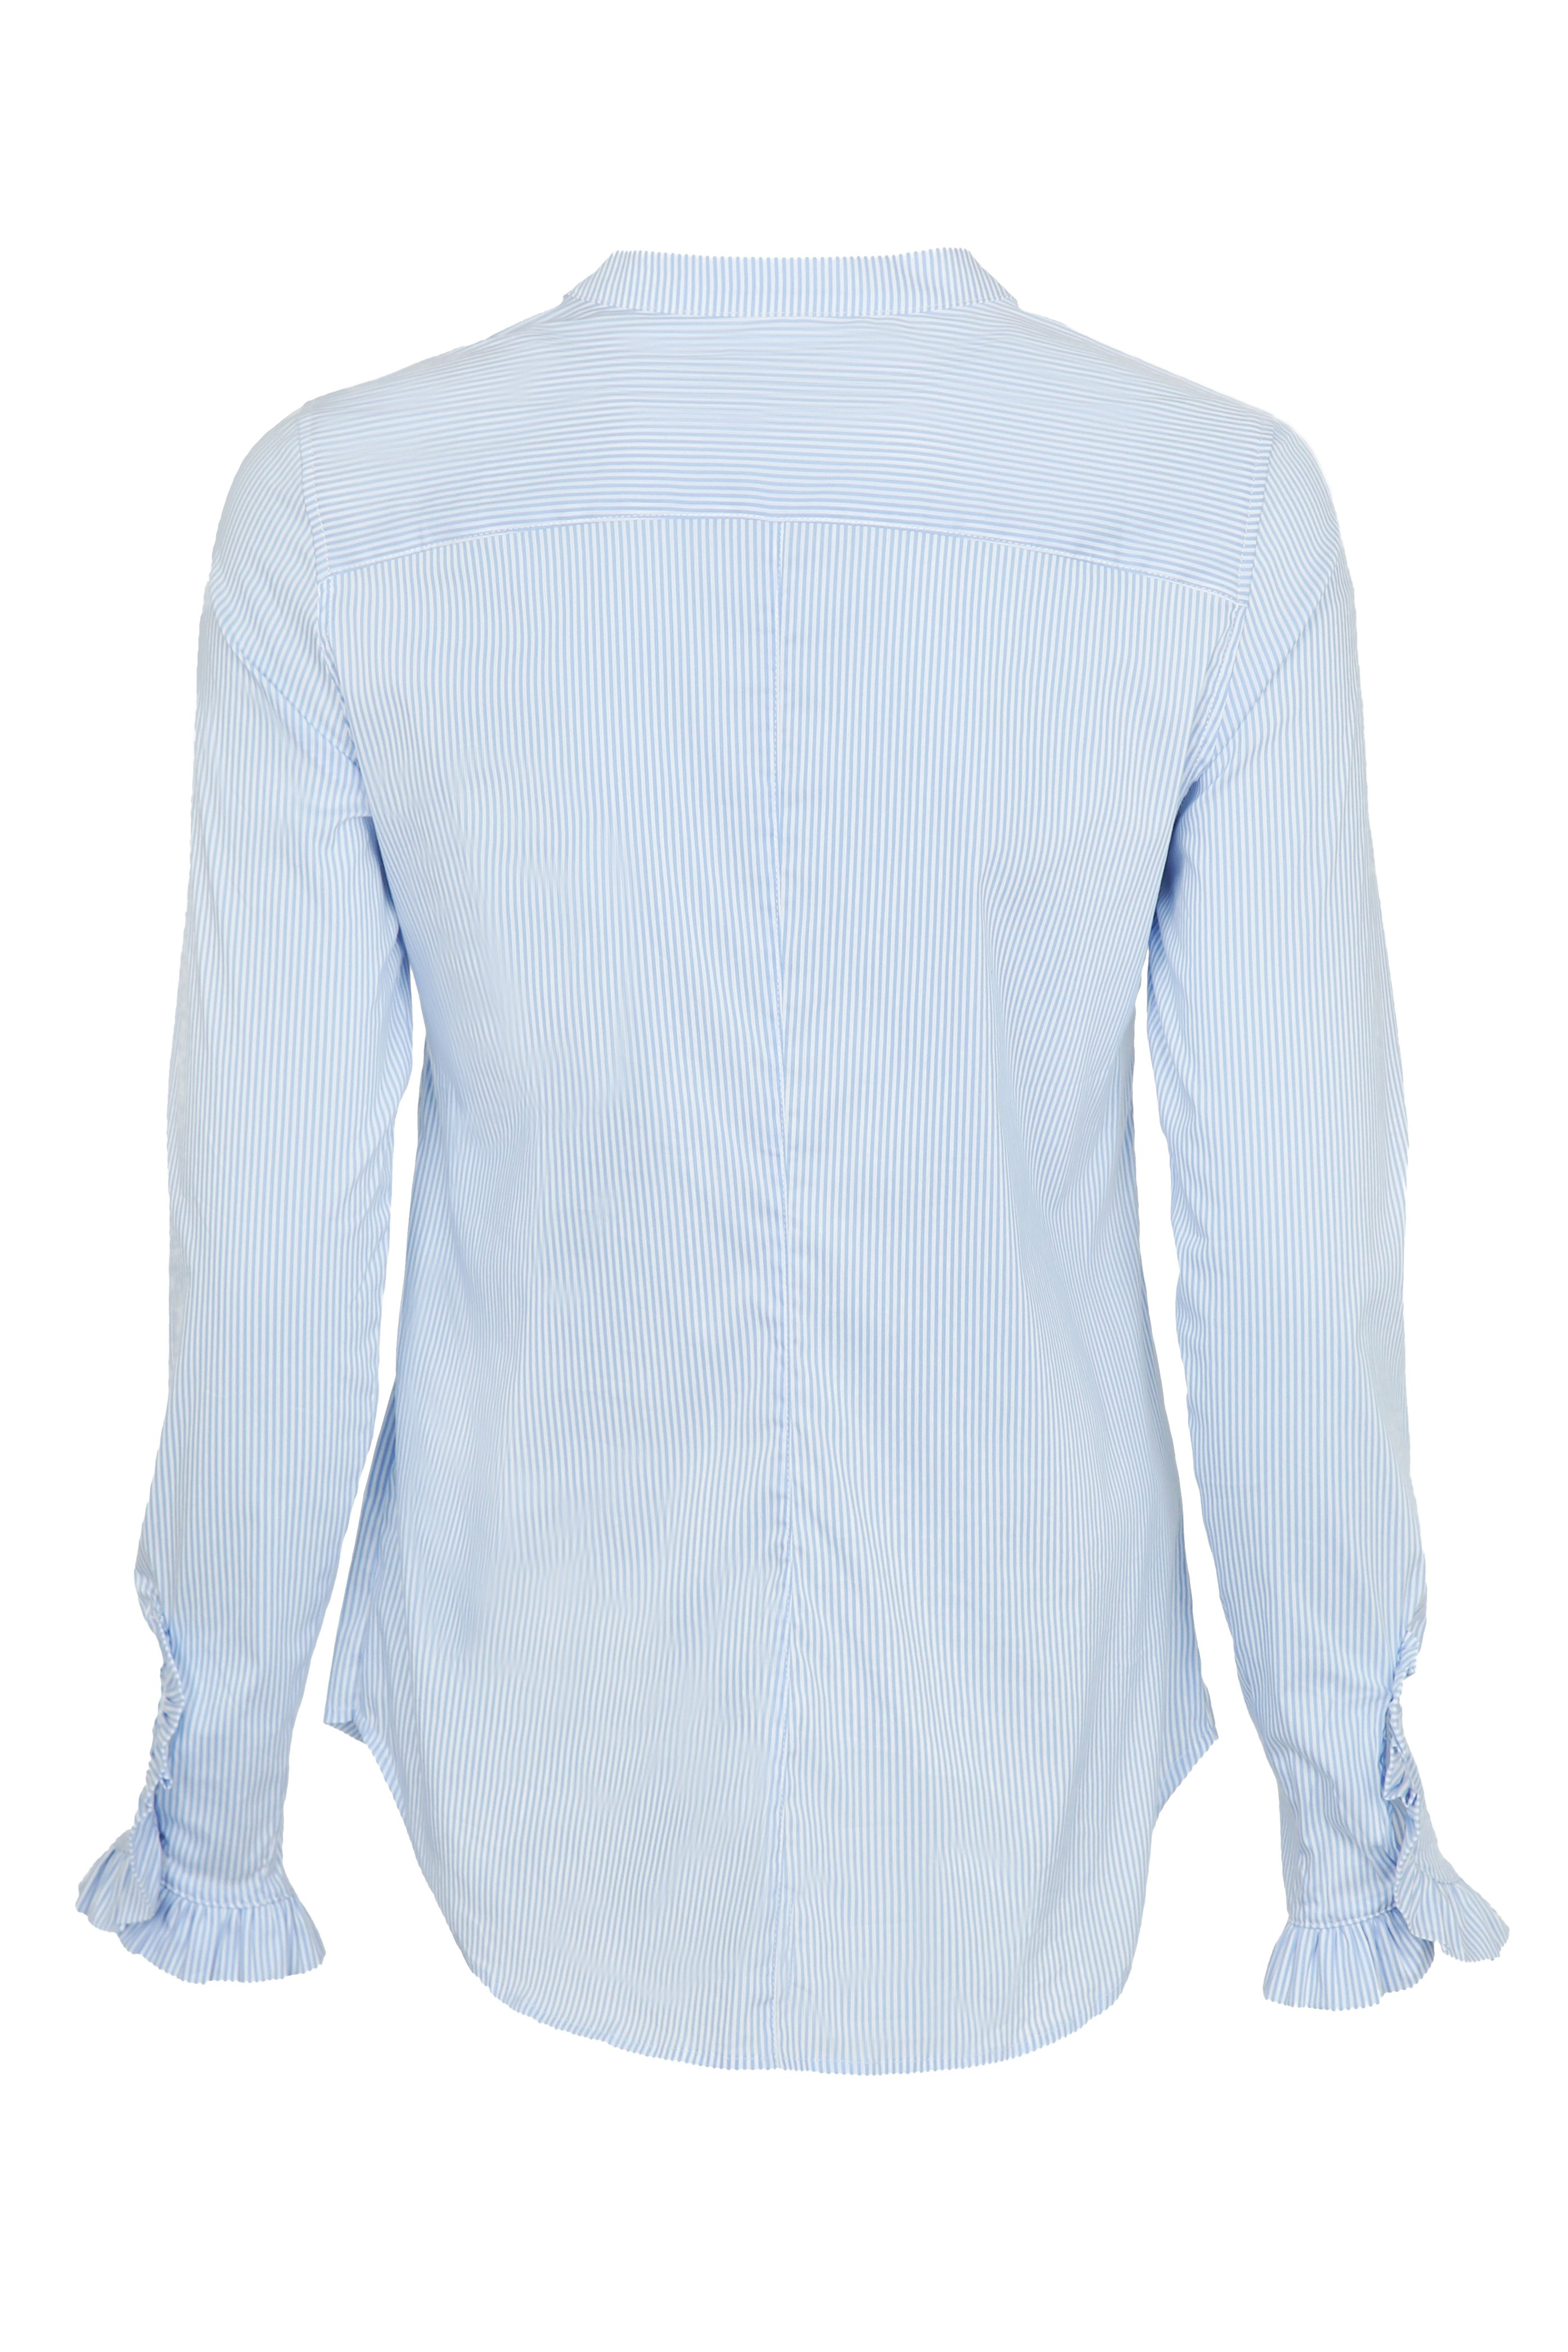 Mos Mosh MATTIE Skjorte blue Zalando.no